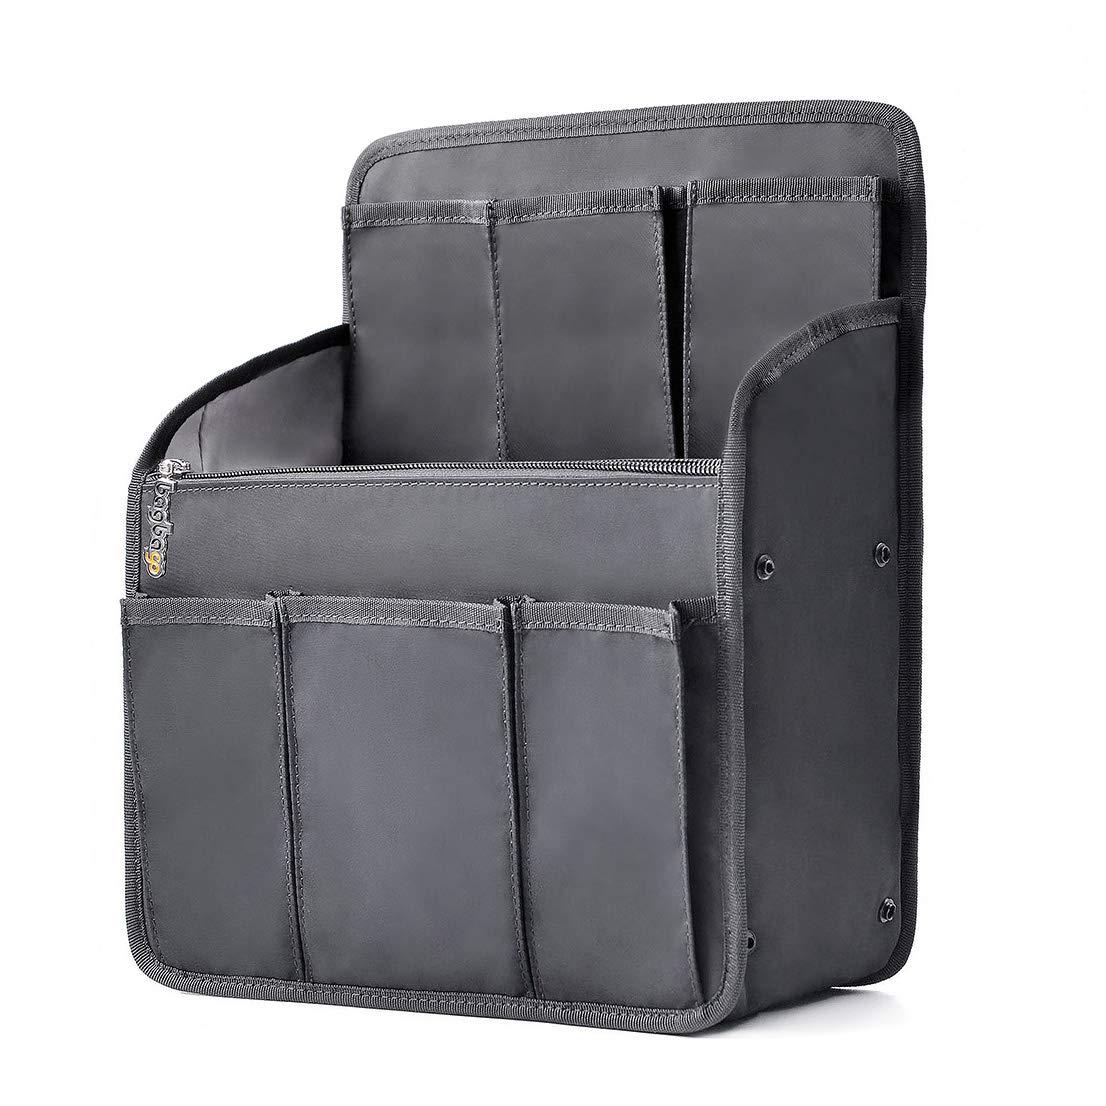 BES CHAN Backpack Insert Organizer Handbag Organizer Diaper Bag Gadget Organization MLA000428-M